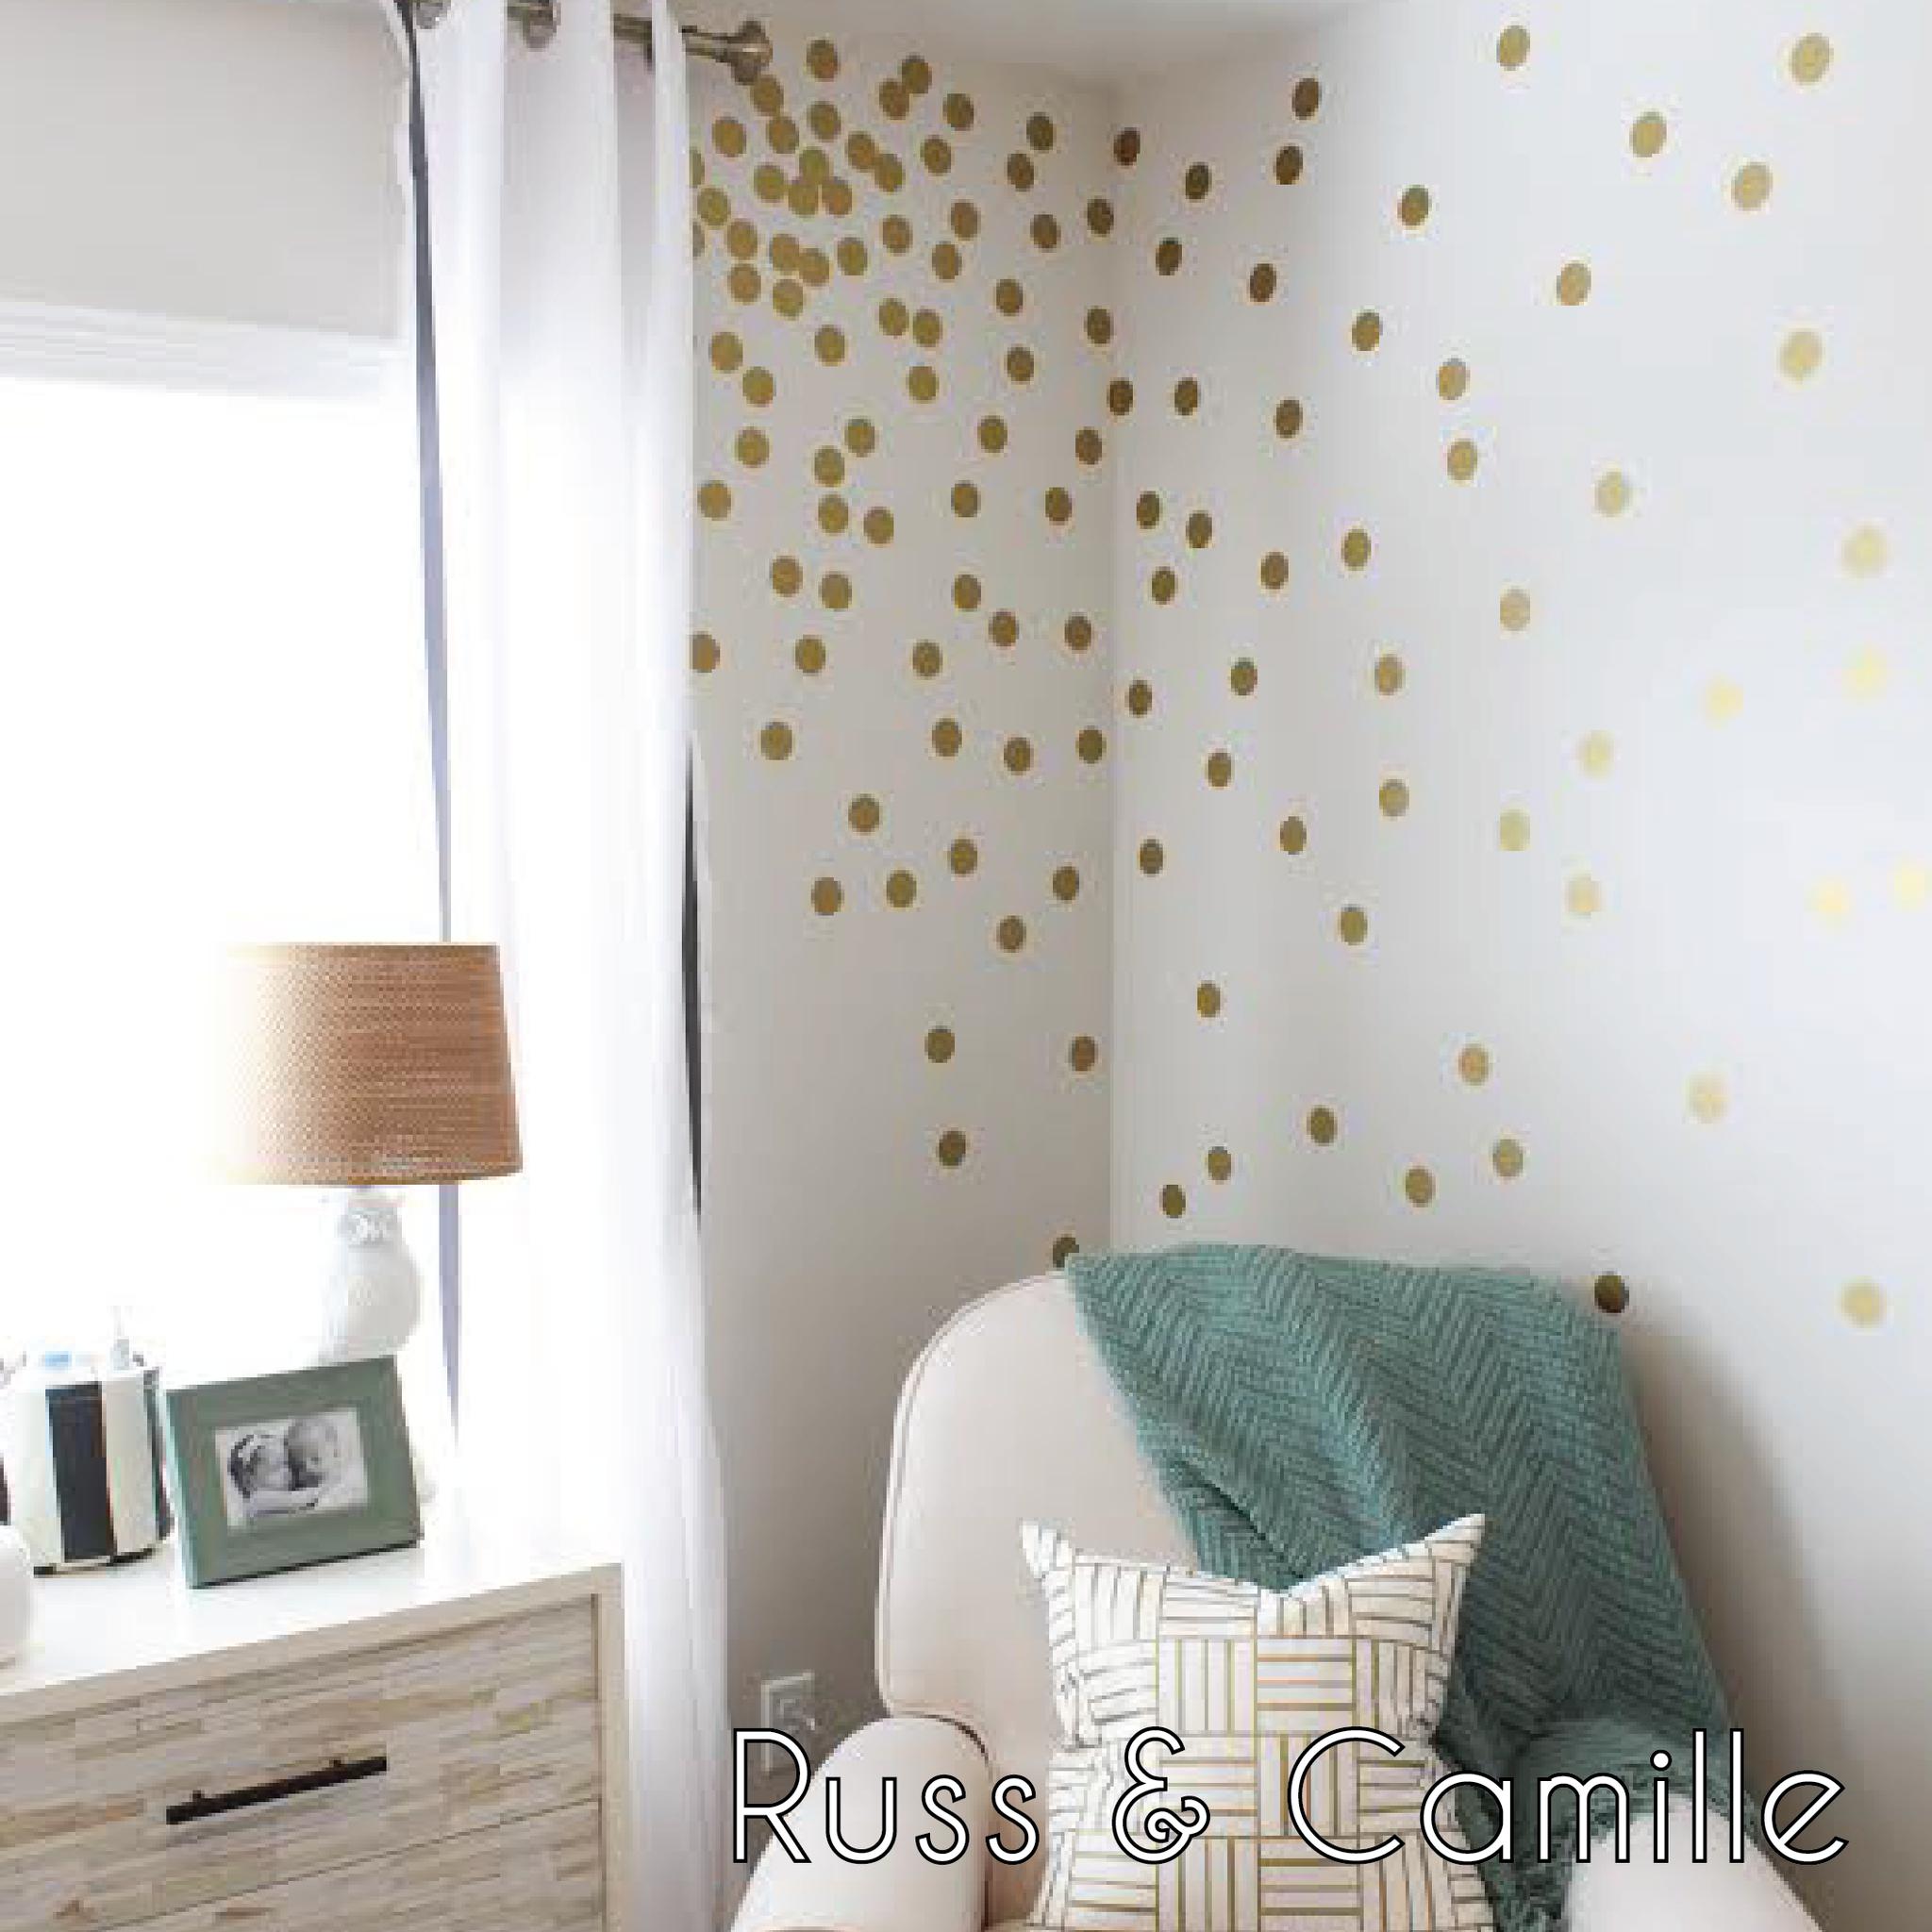 Polka dot stickers for walls polka dots wall decal polka dots polka dot wall decals polka dot walls confetti and wall decals wall decals polka dots amipublicfo Image collections